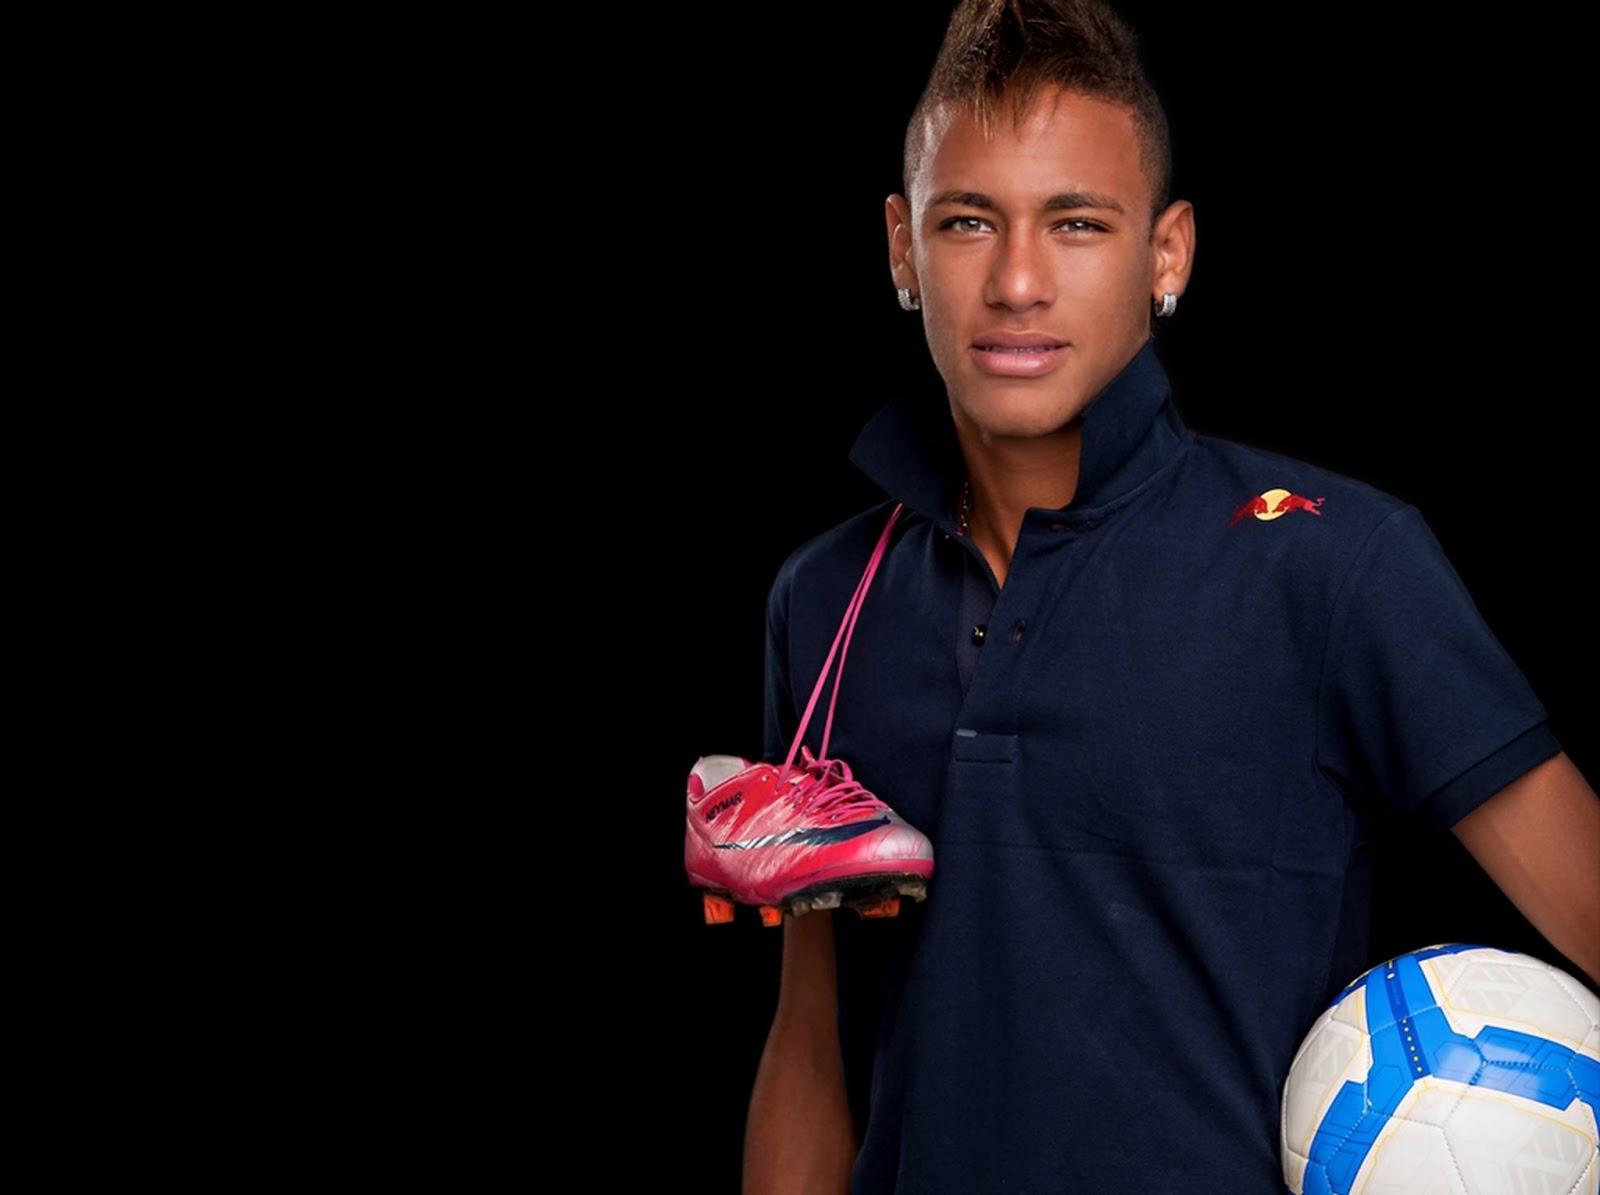 Neymar 2014 Hairstyle